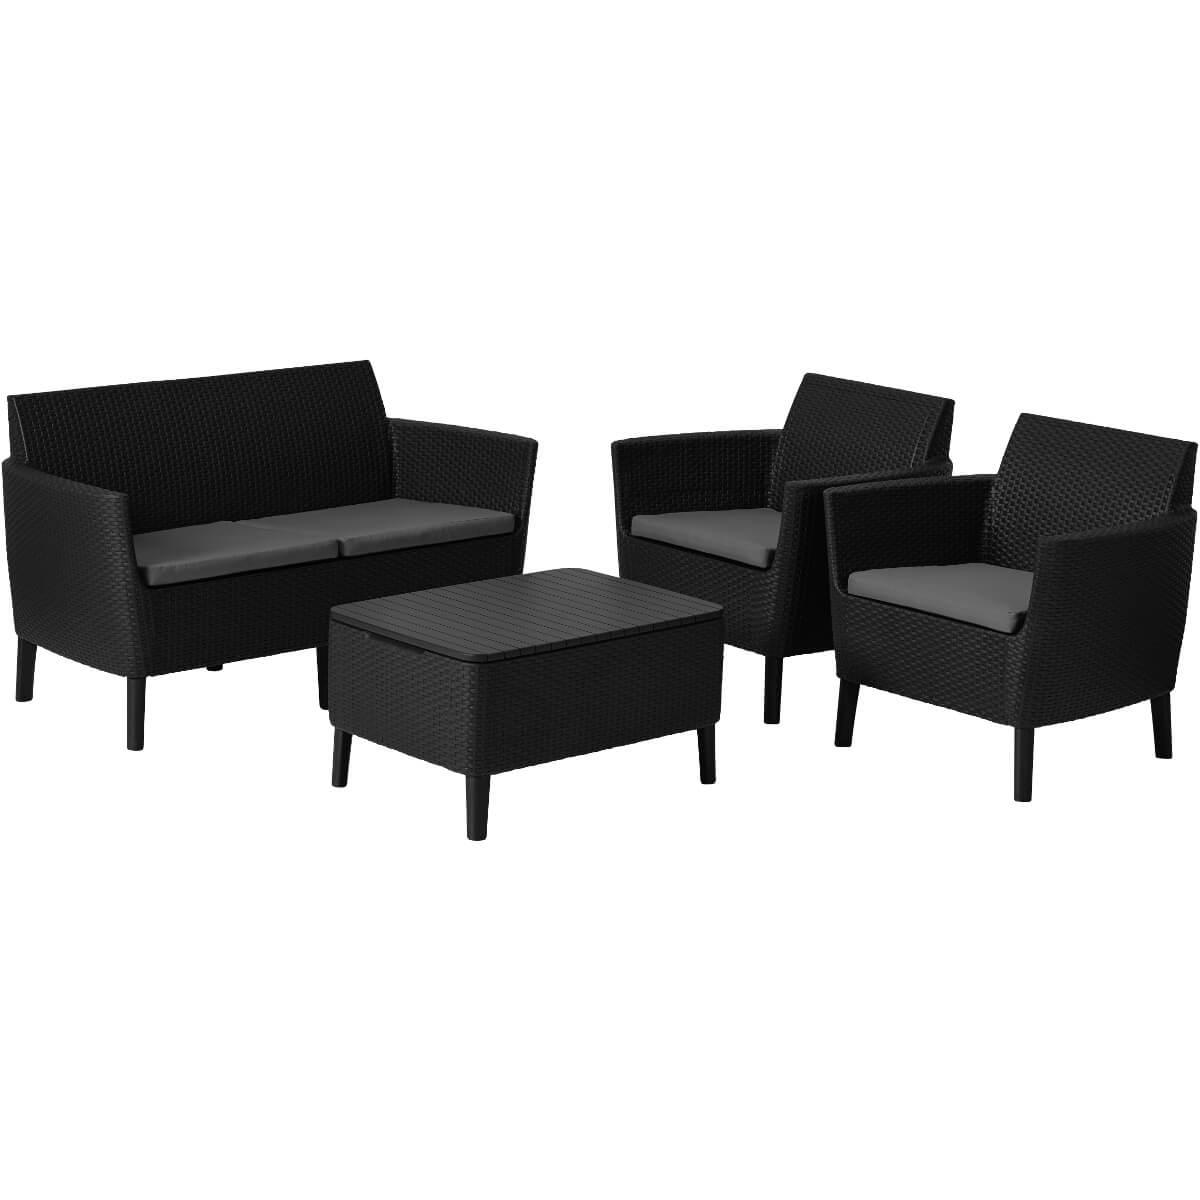 Комплект мебели Allibert Salemo 17206003